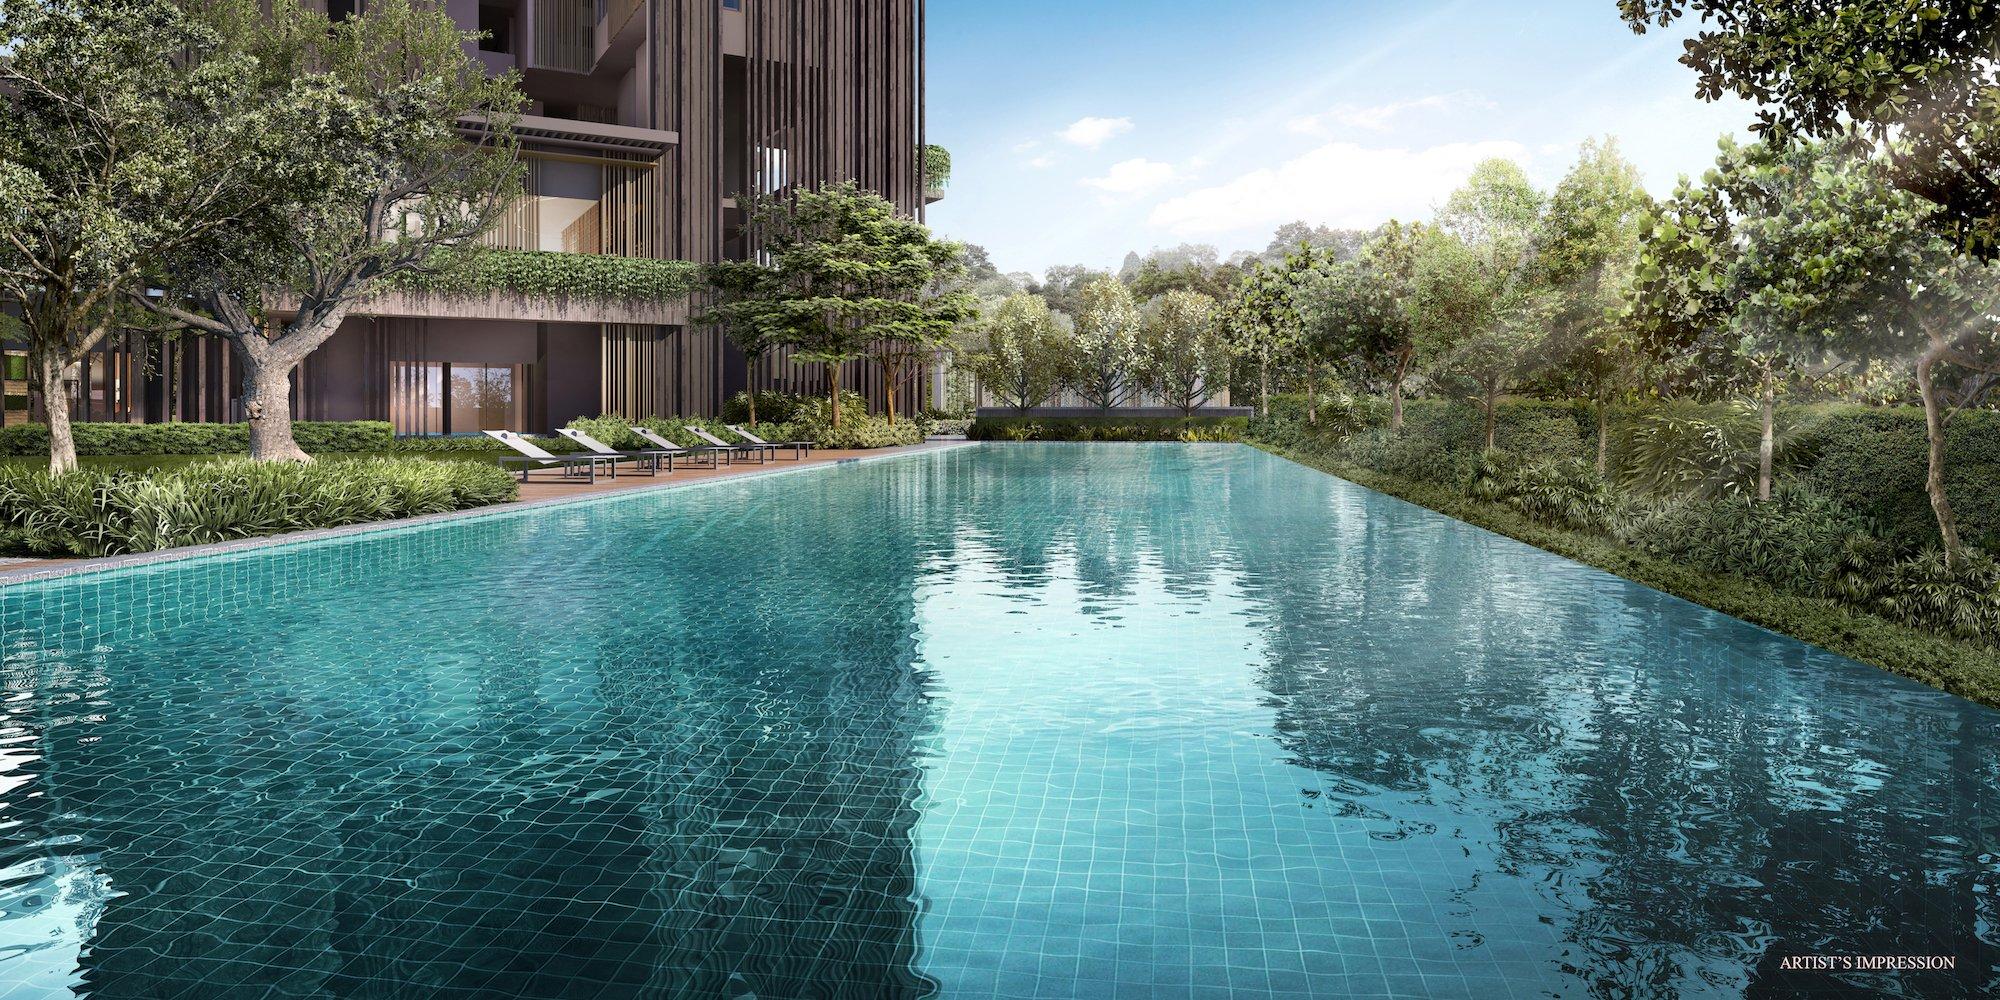 The Avenir 50m Lap Pool